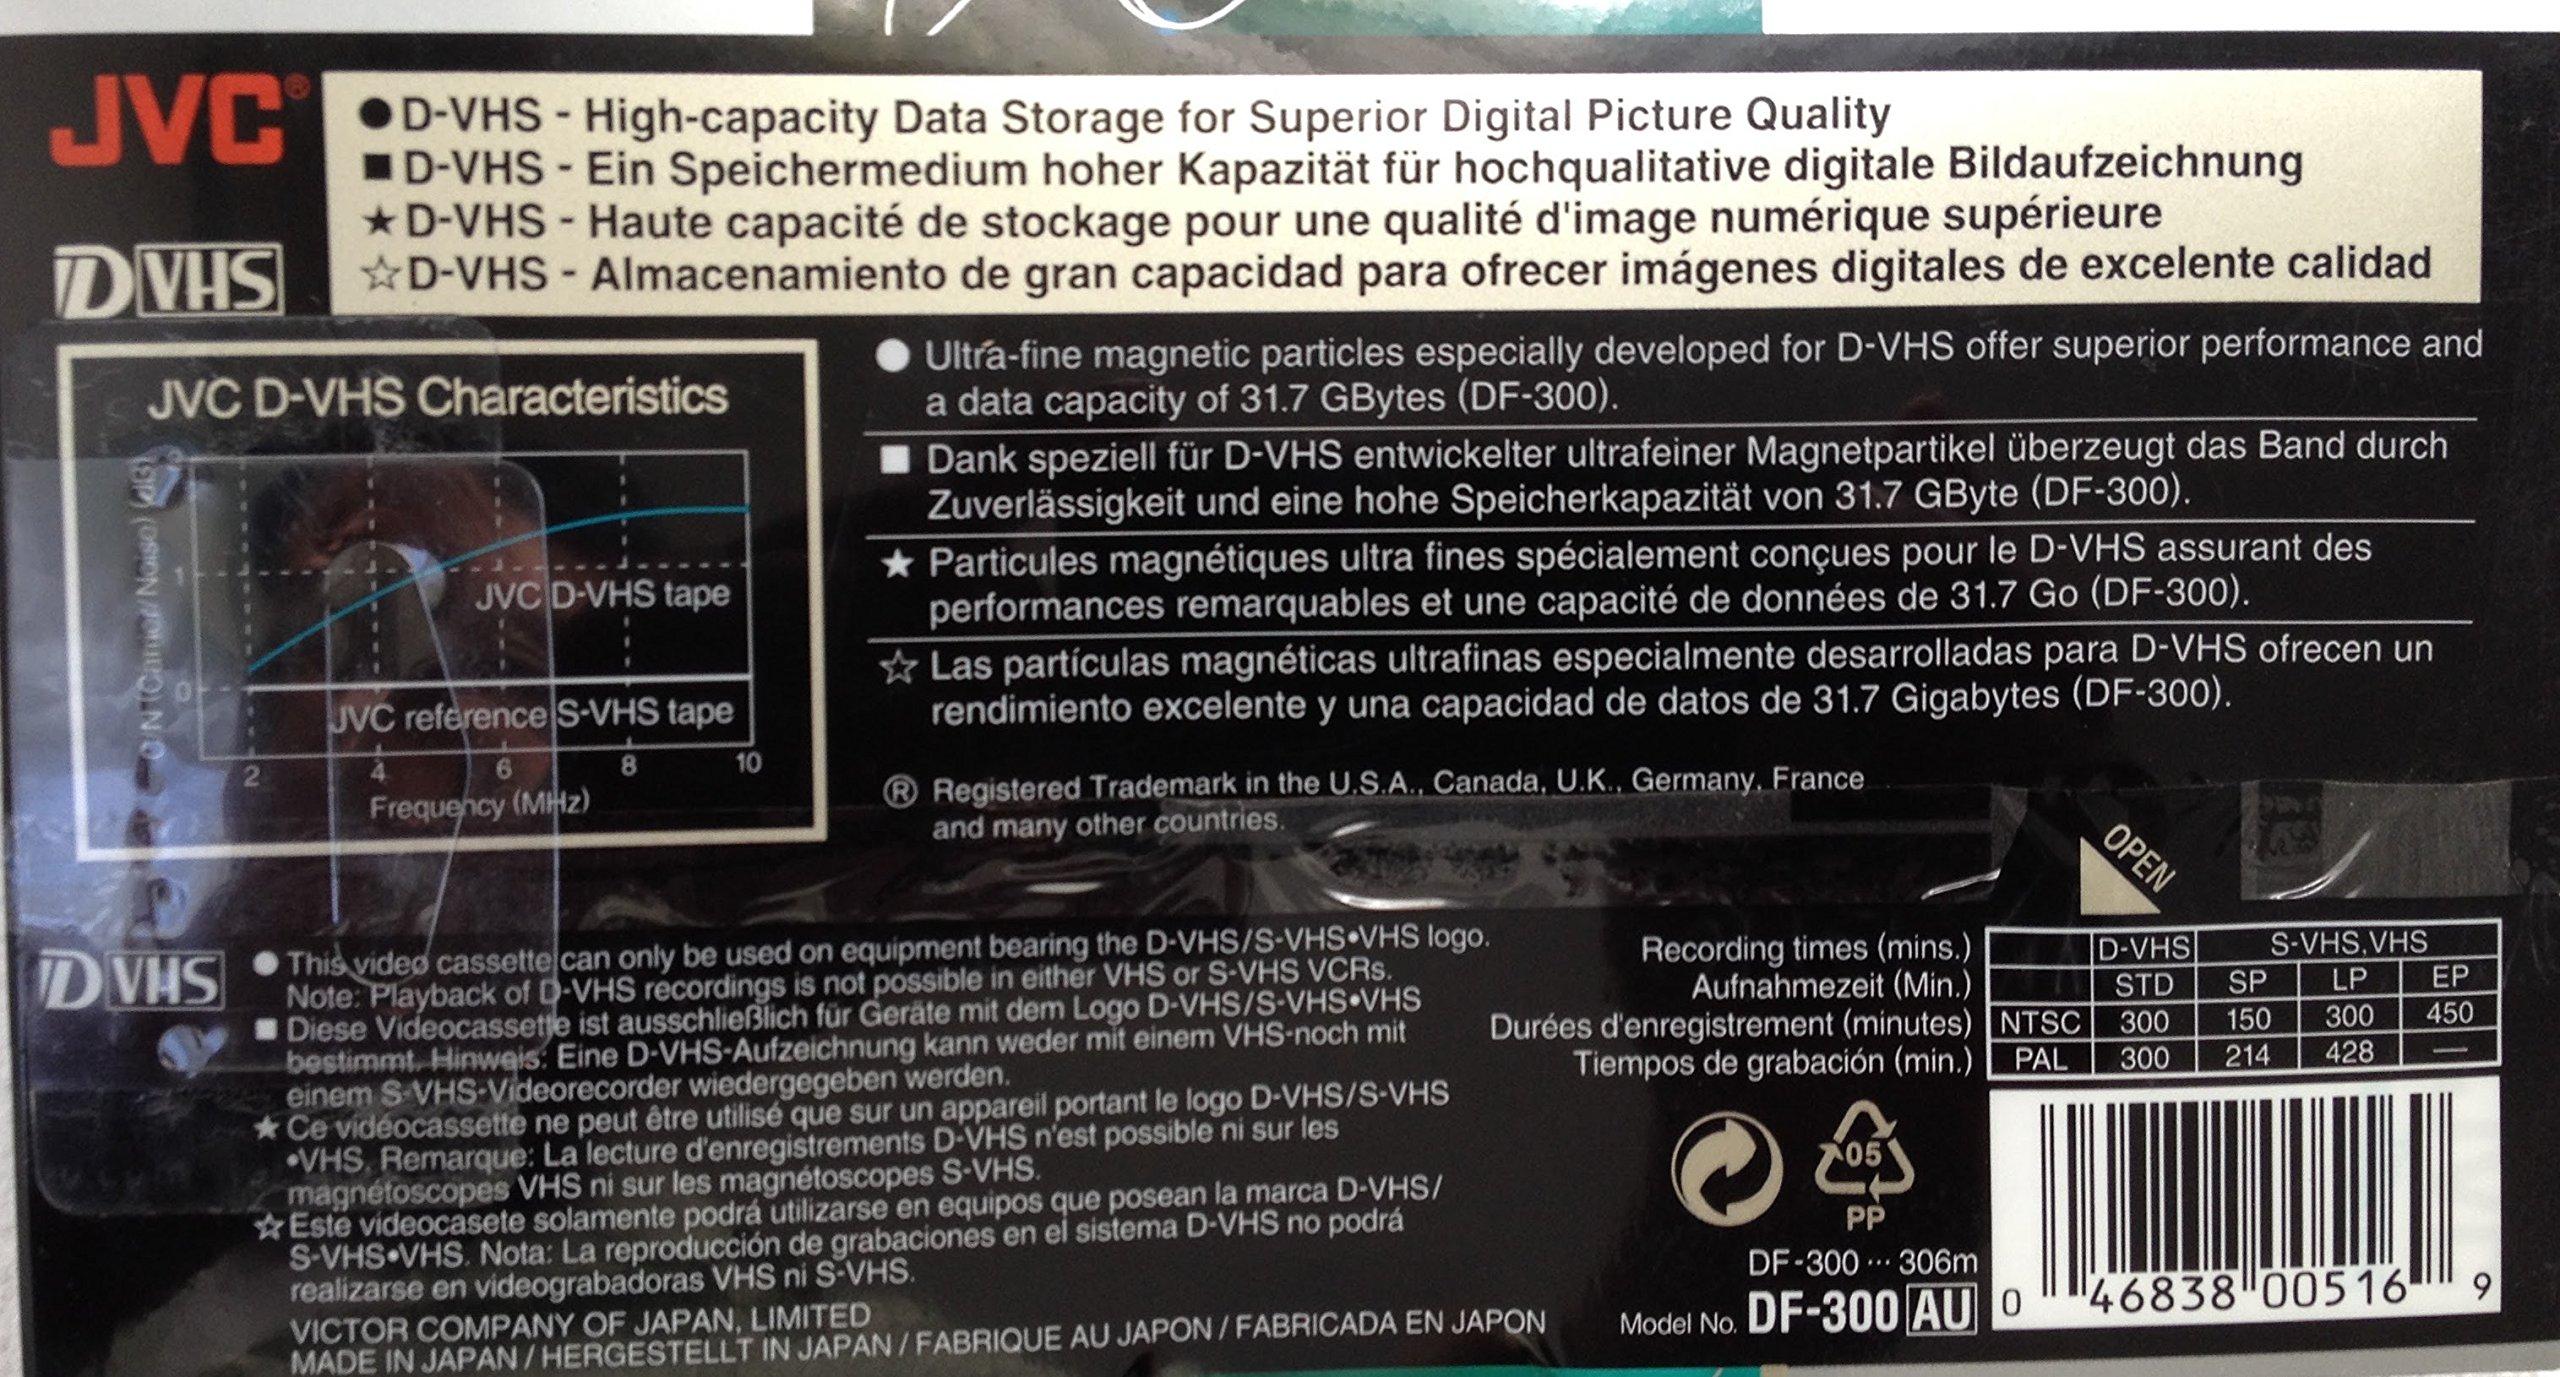 JVC DF300AU D-VHS Video Tape (300 min.) by JVC